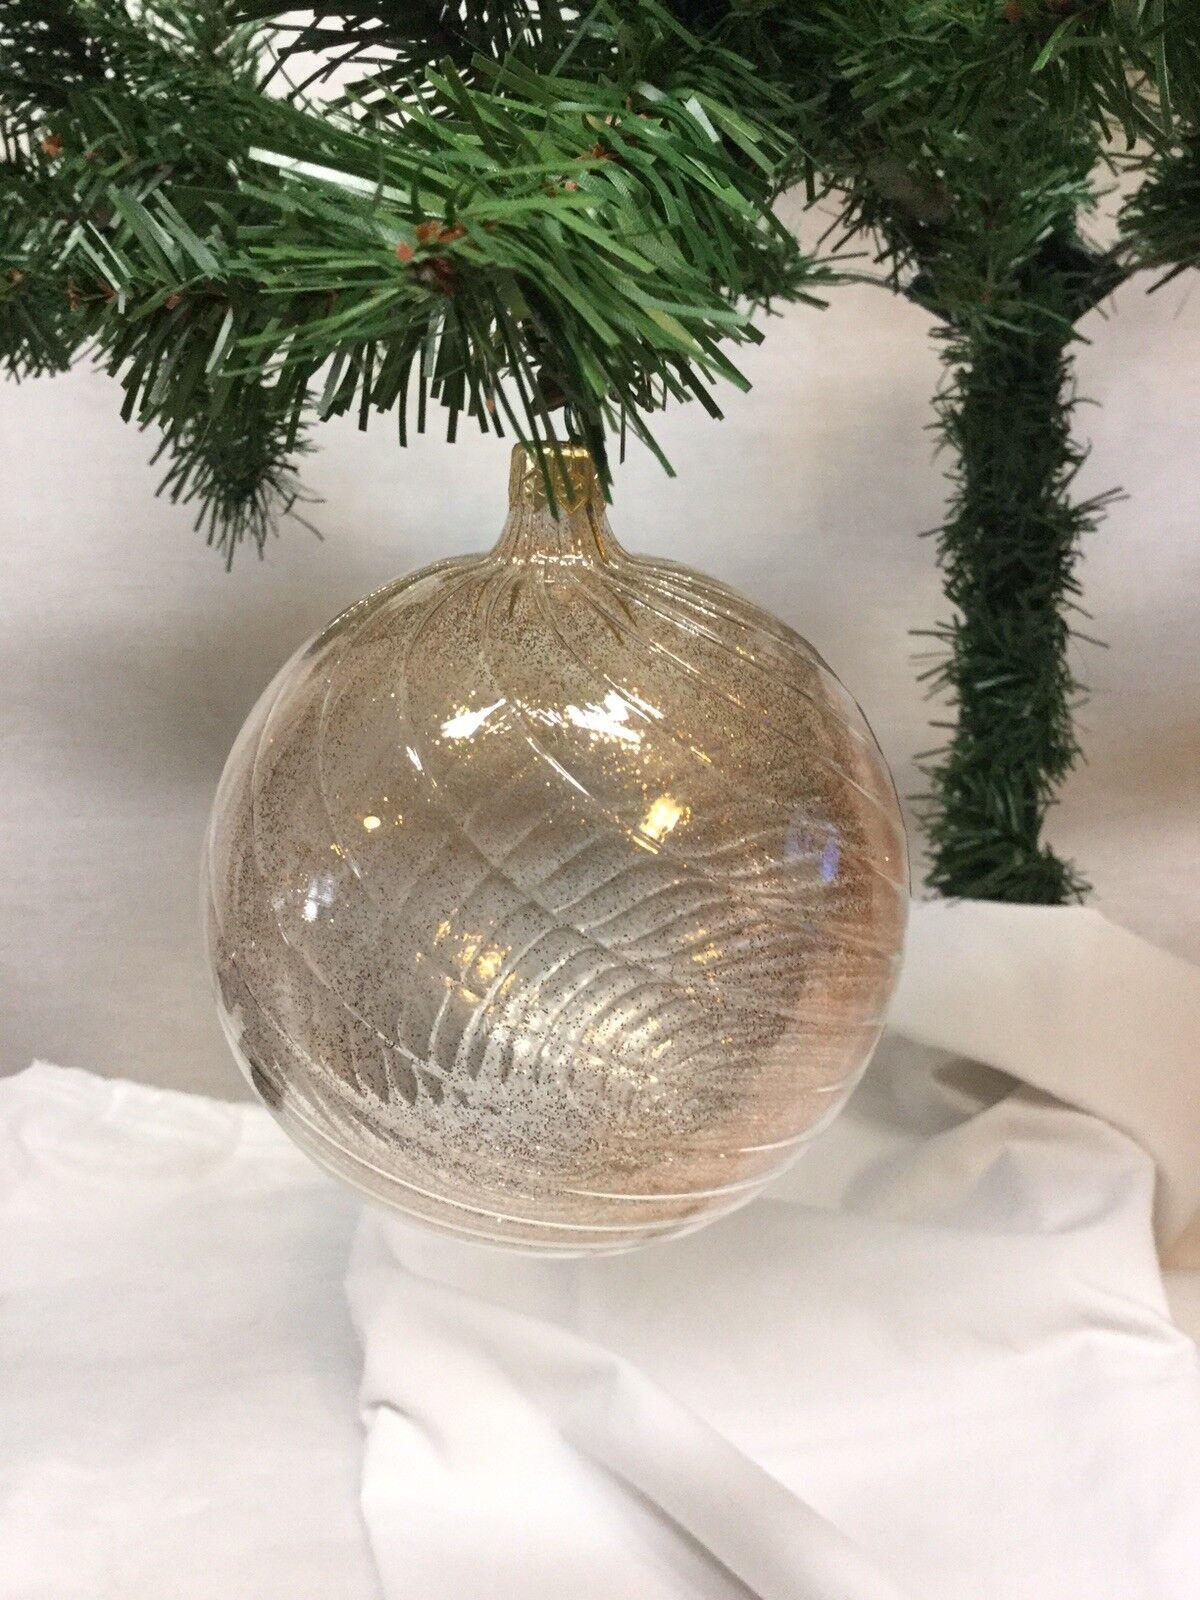 Neiman Marcus  Round Glass Ball  Christmas Ornament Iridescent Copper Gold set 6